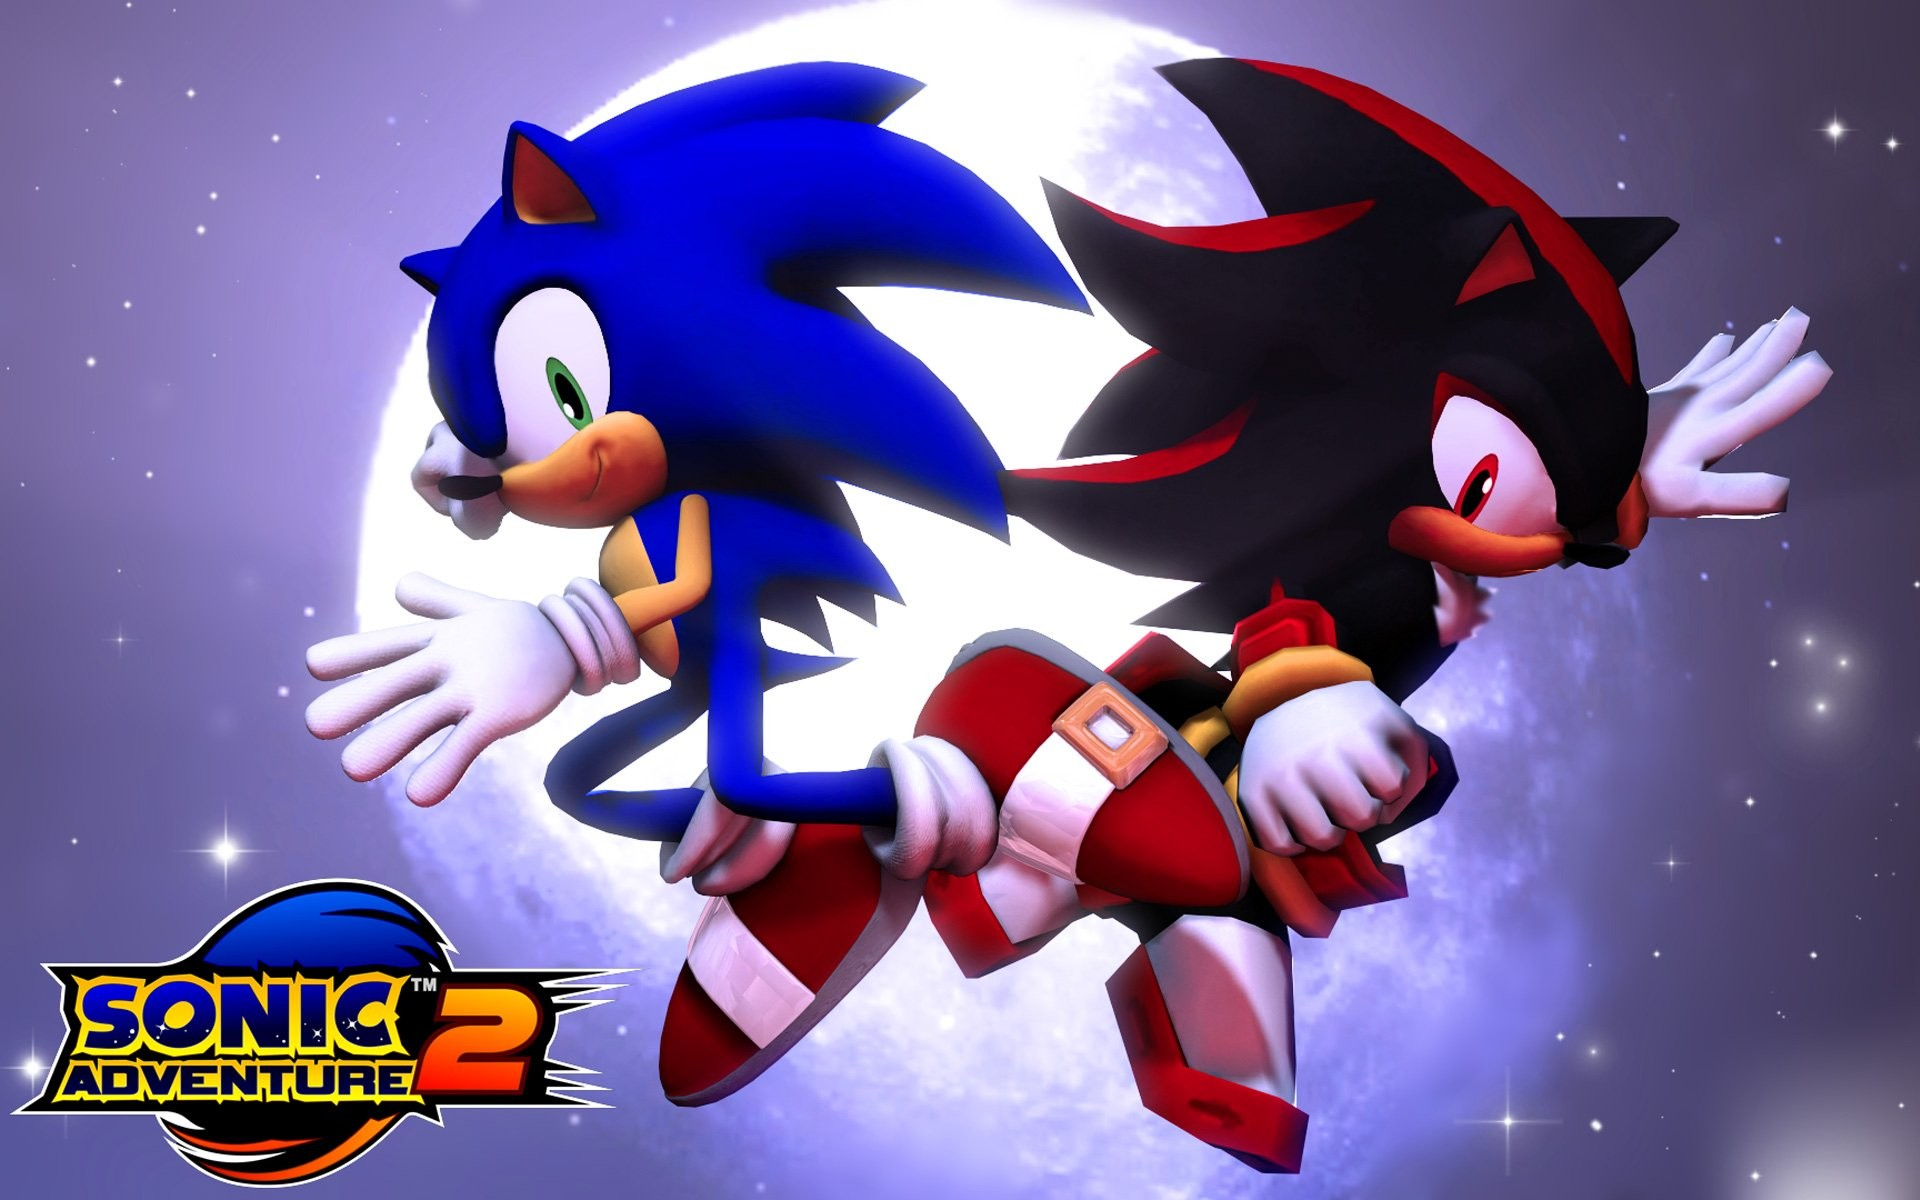 Sonic Adventure 2 Battle Wallpaper 75 Images